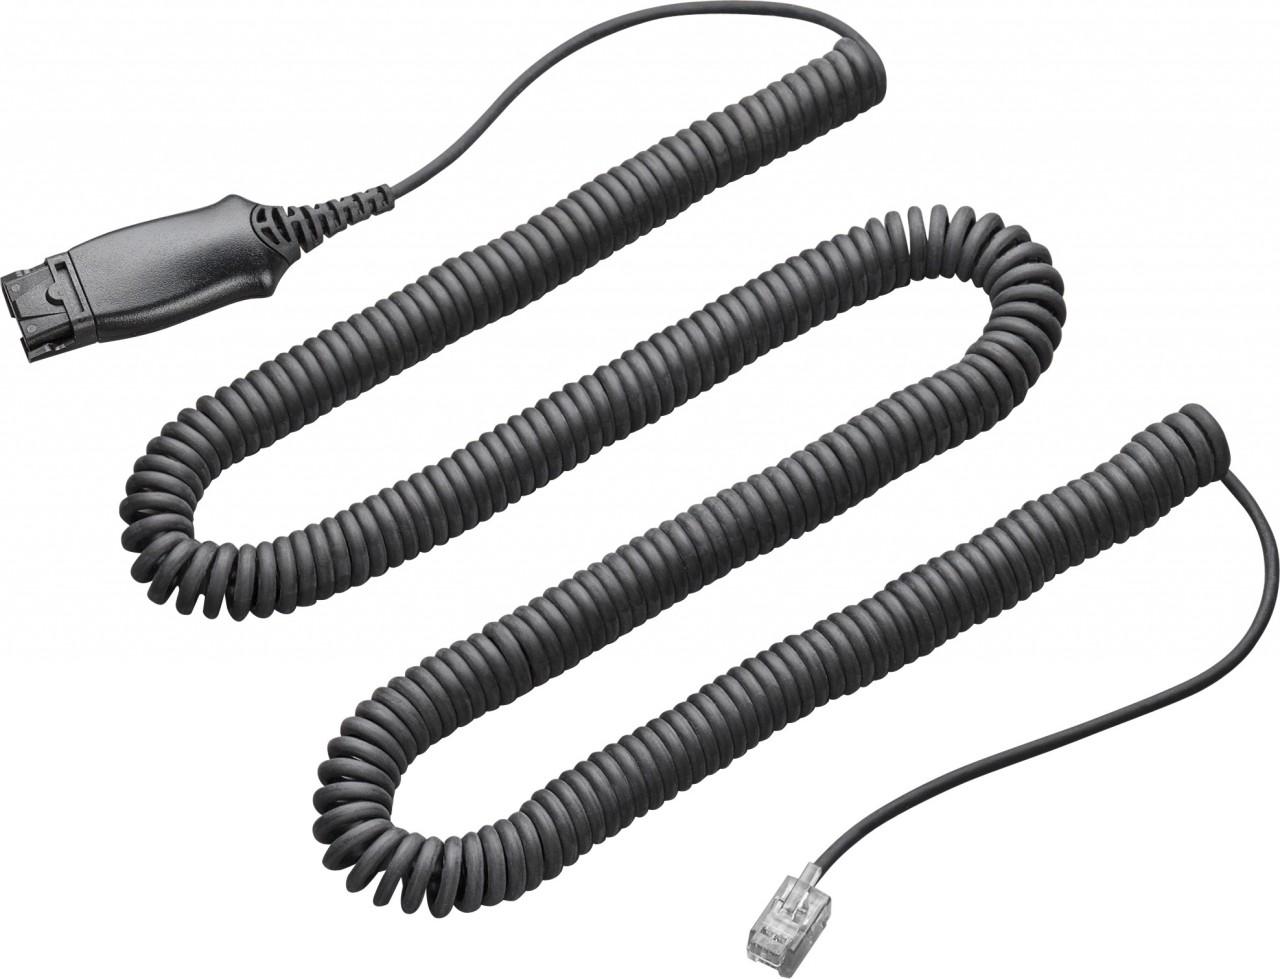 Plantronics HIS cable